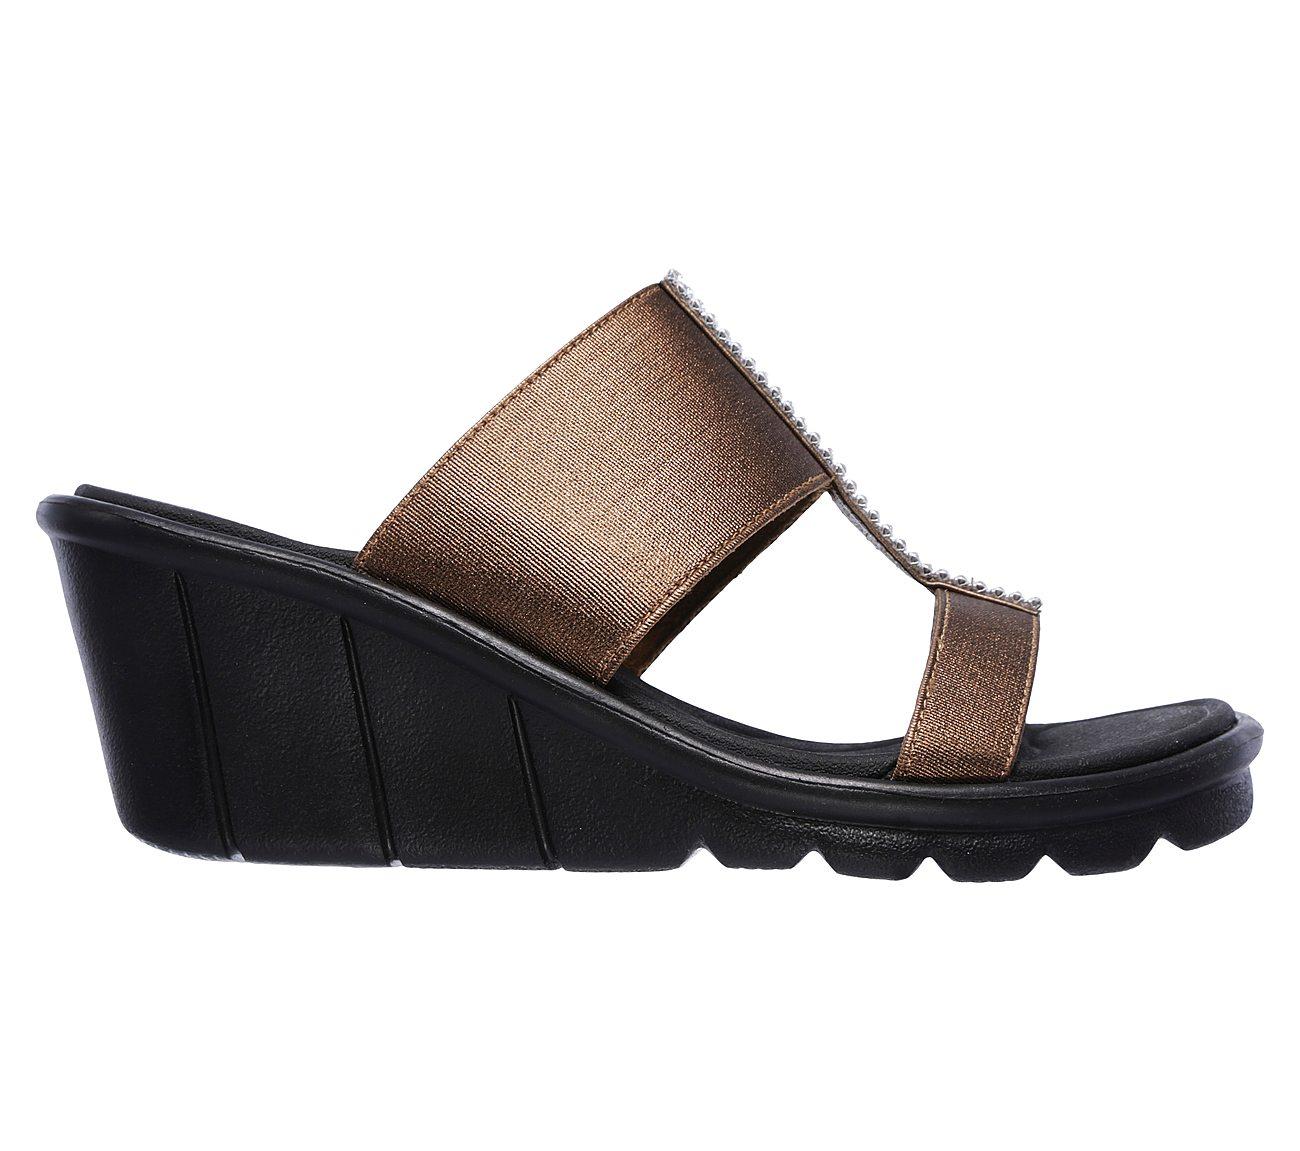 4d168d1d3a46 Buy SKECHERS Promenade - Dinner Date Cali Shoes only  29.40